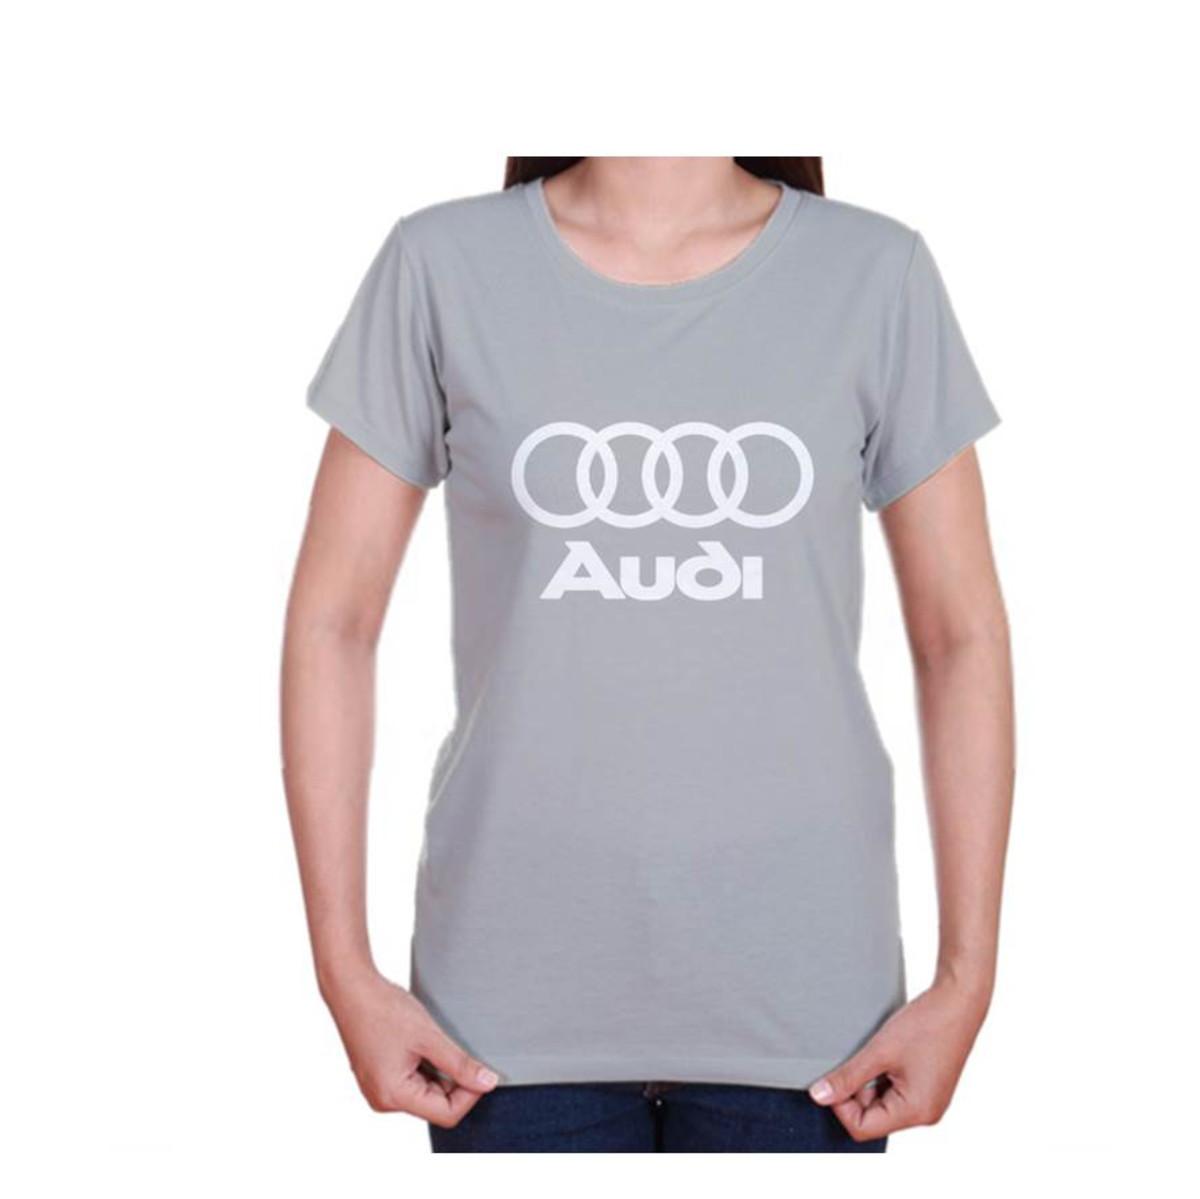 46fe830cf Camiseta Audi - Adulto e Infantil no Elo7 | Diorens (D2A312)